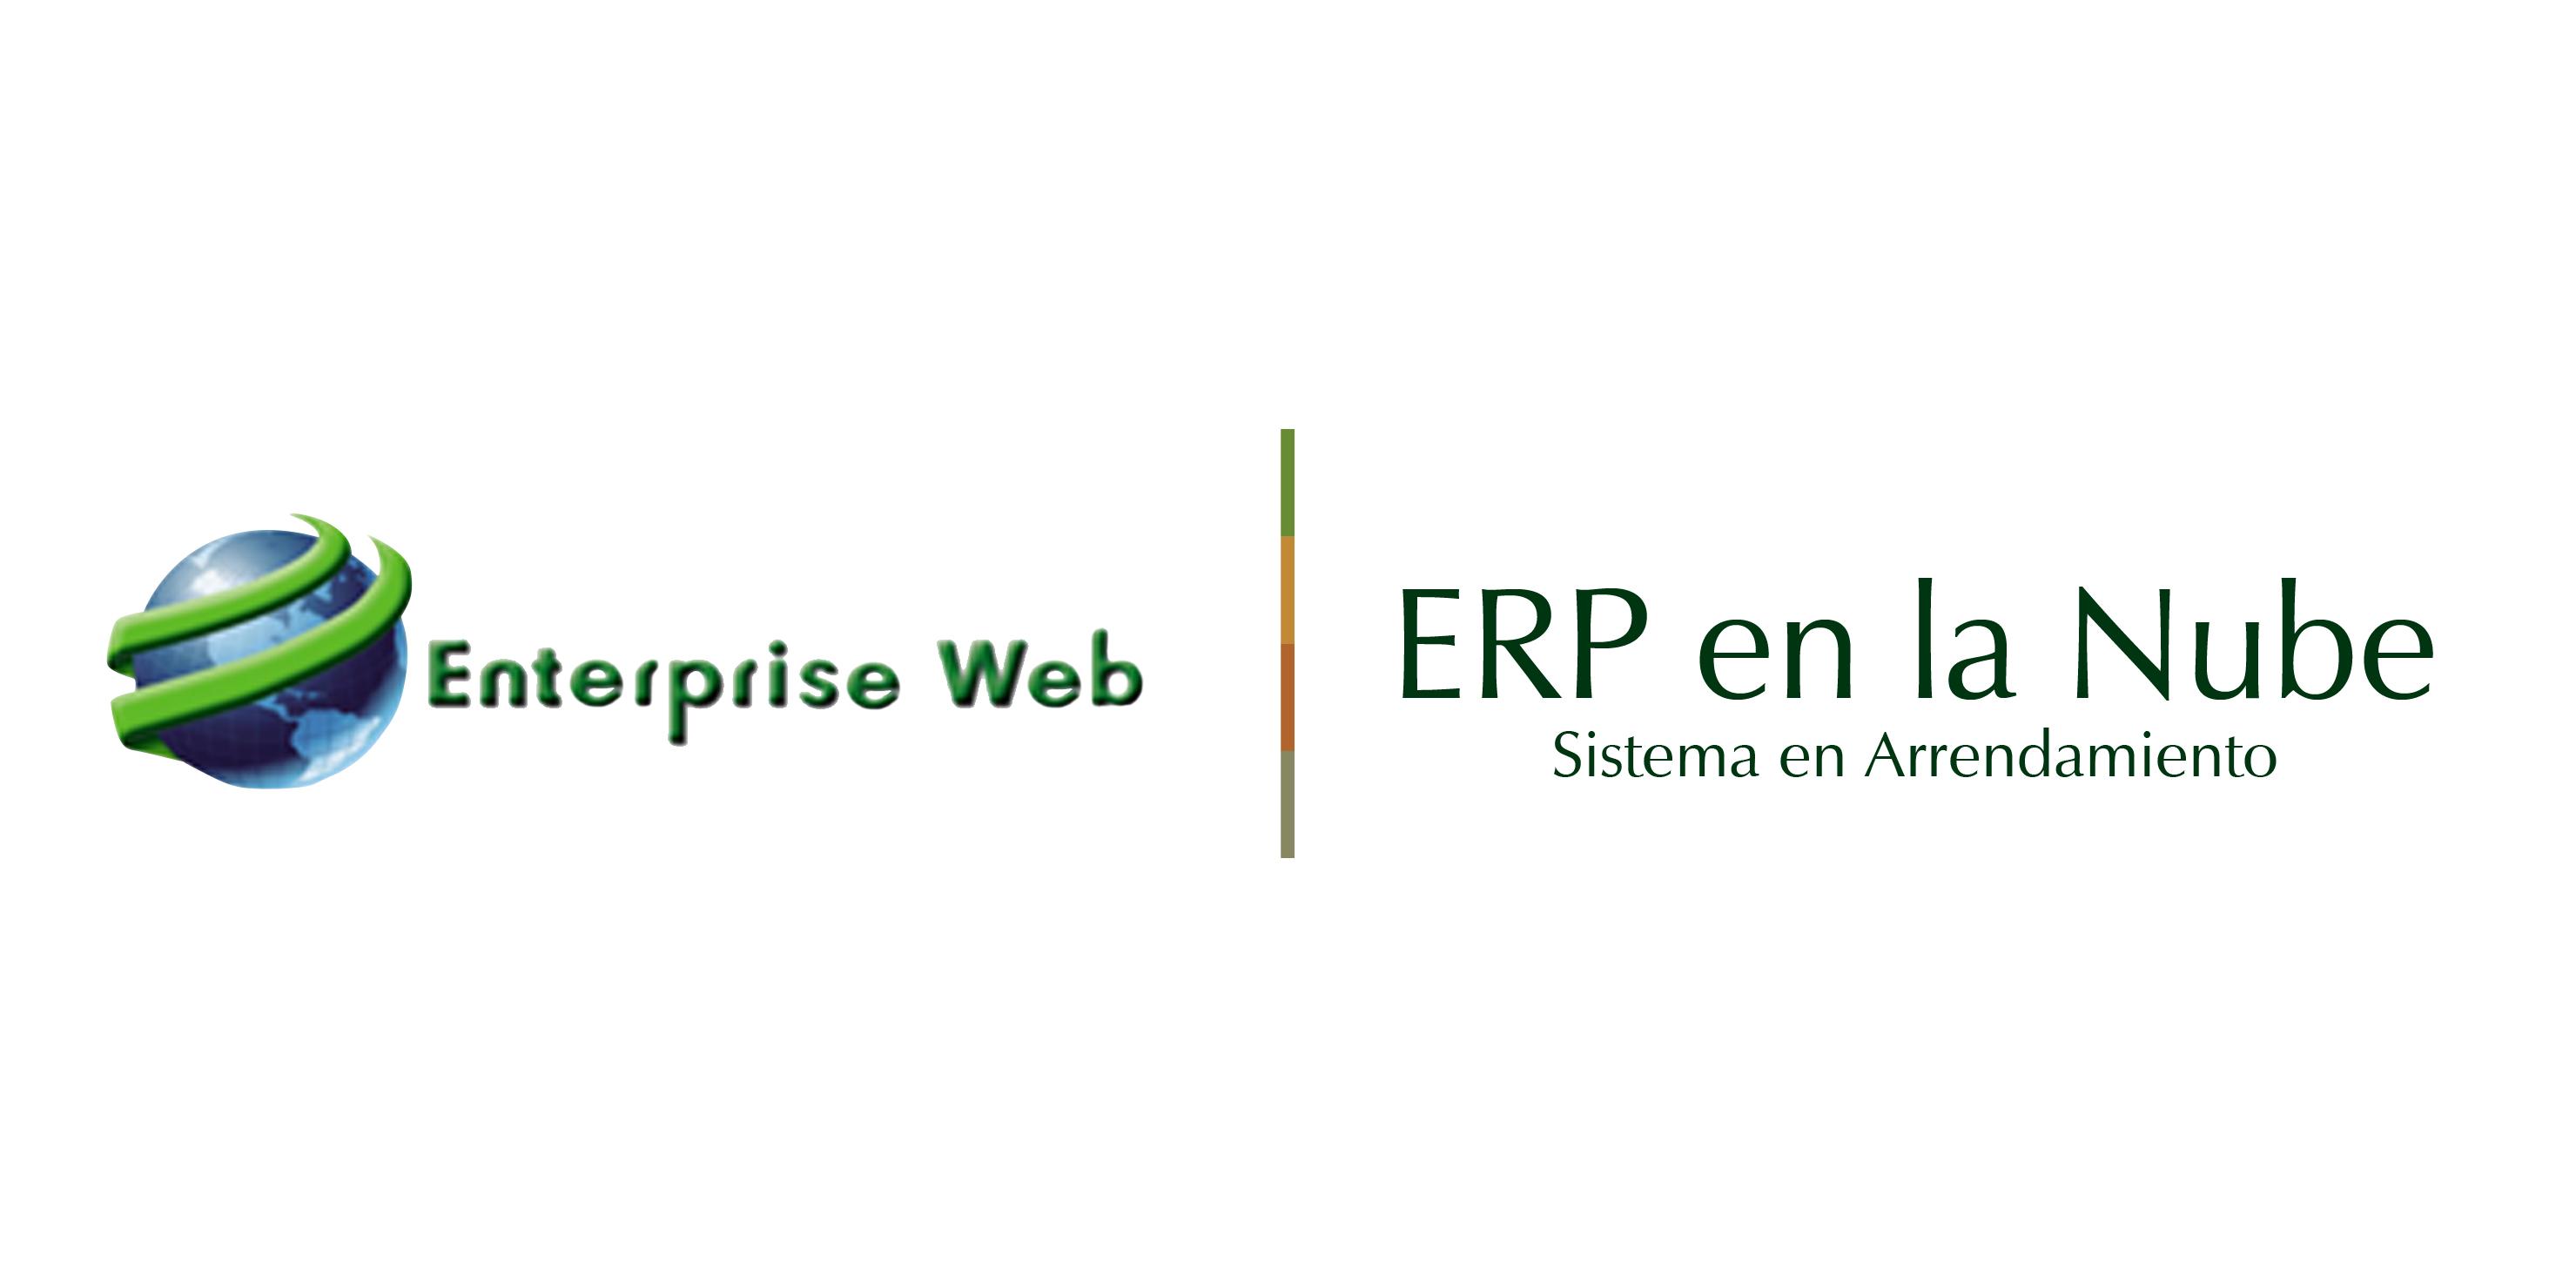 Software ERP en la Nube | Software ERP | Novasoft S.A.S.